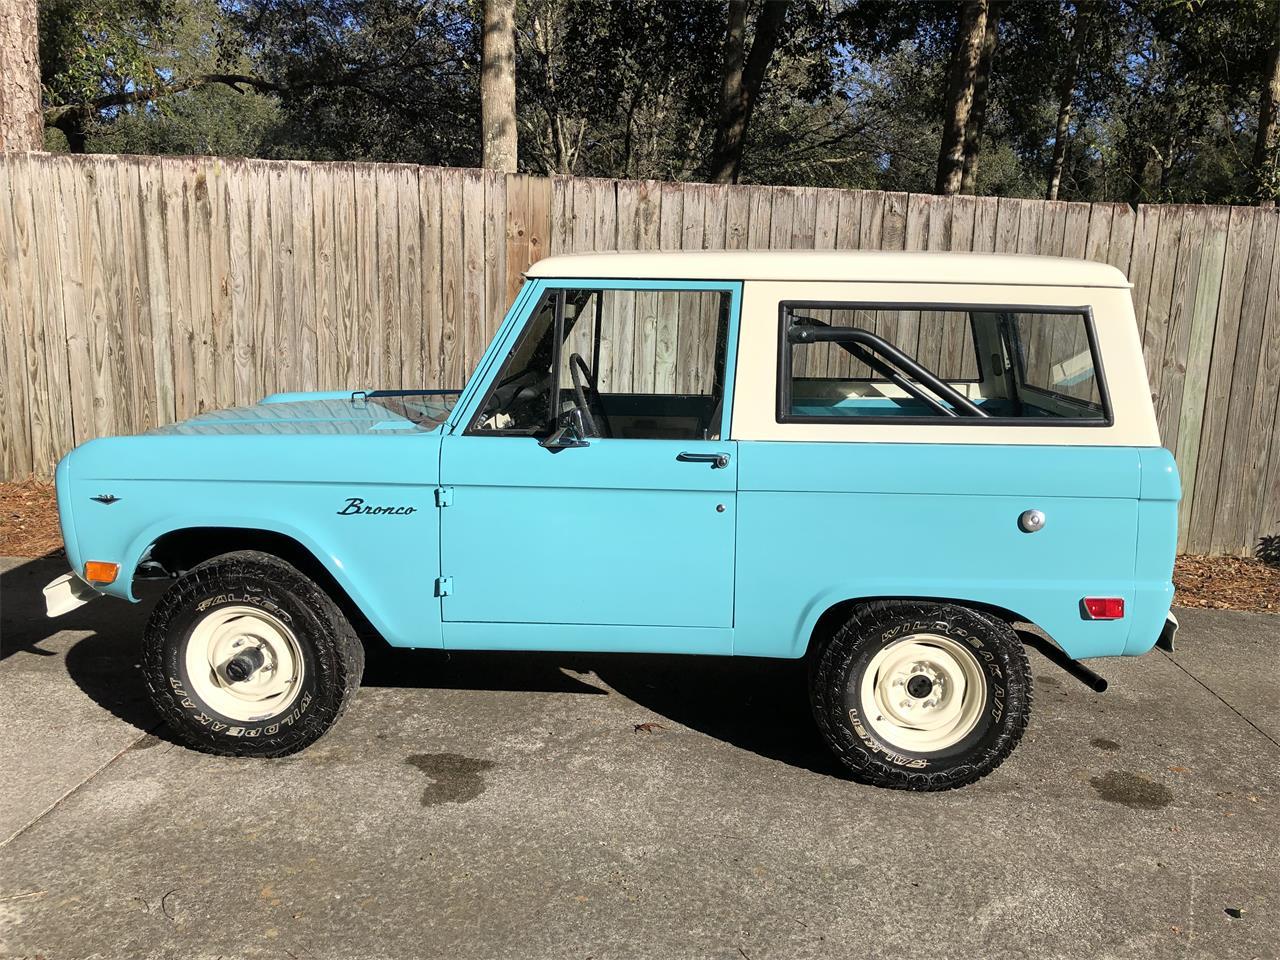 1968 Ford Bronco For Sale In Jacksonville Fl Classiccarsbay Com